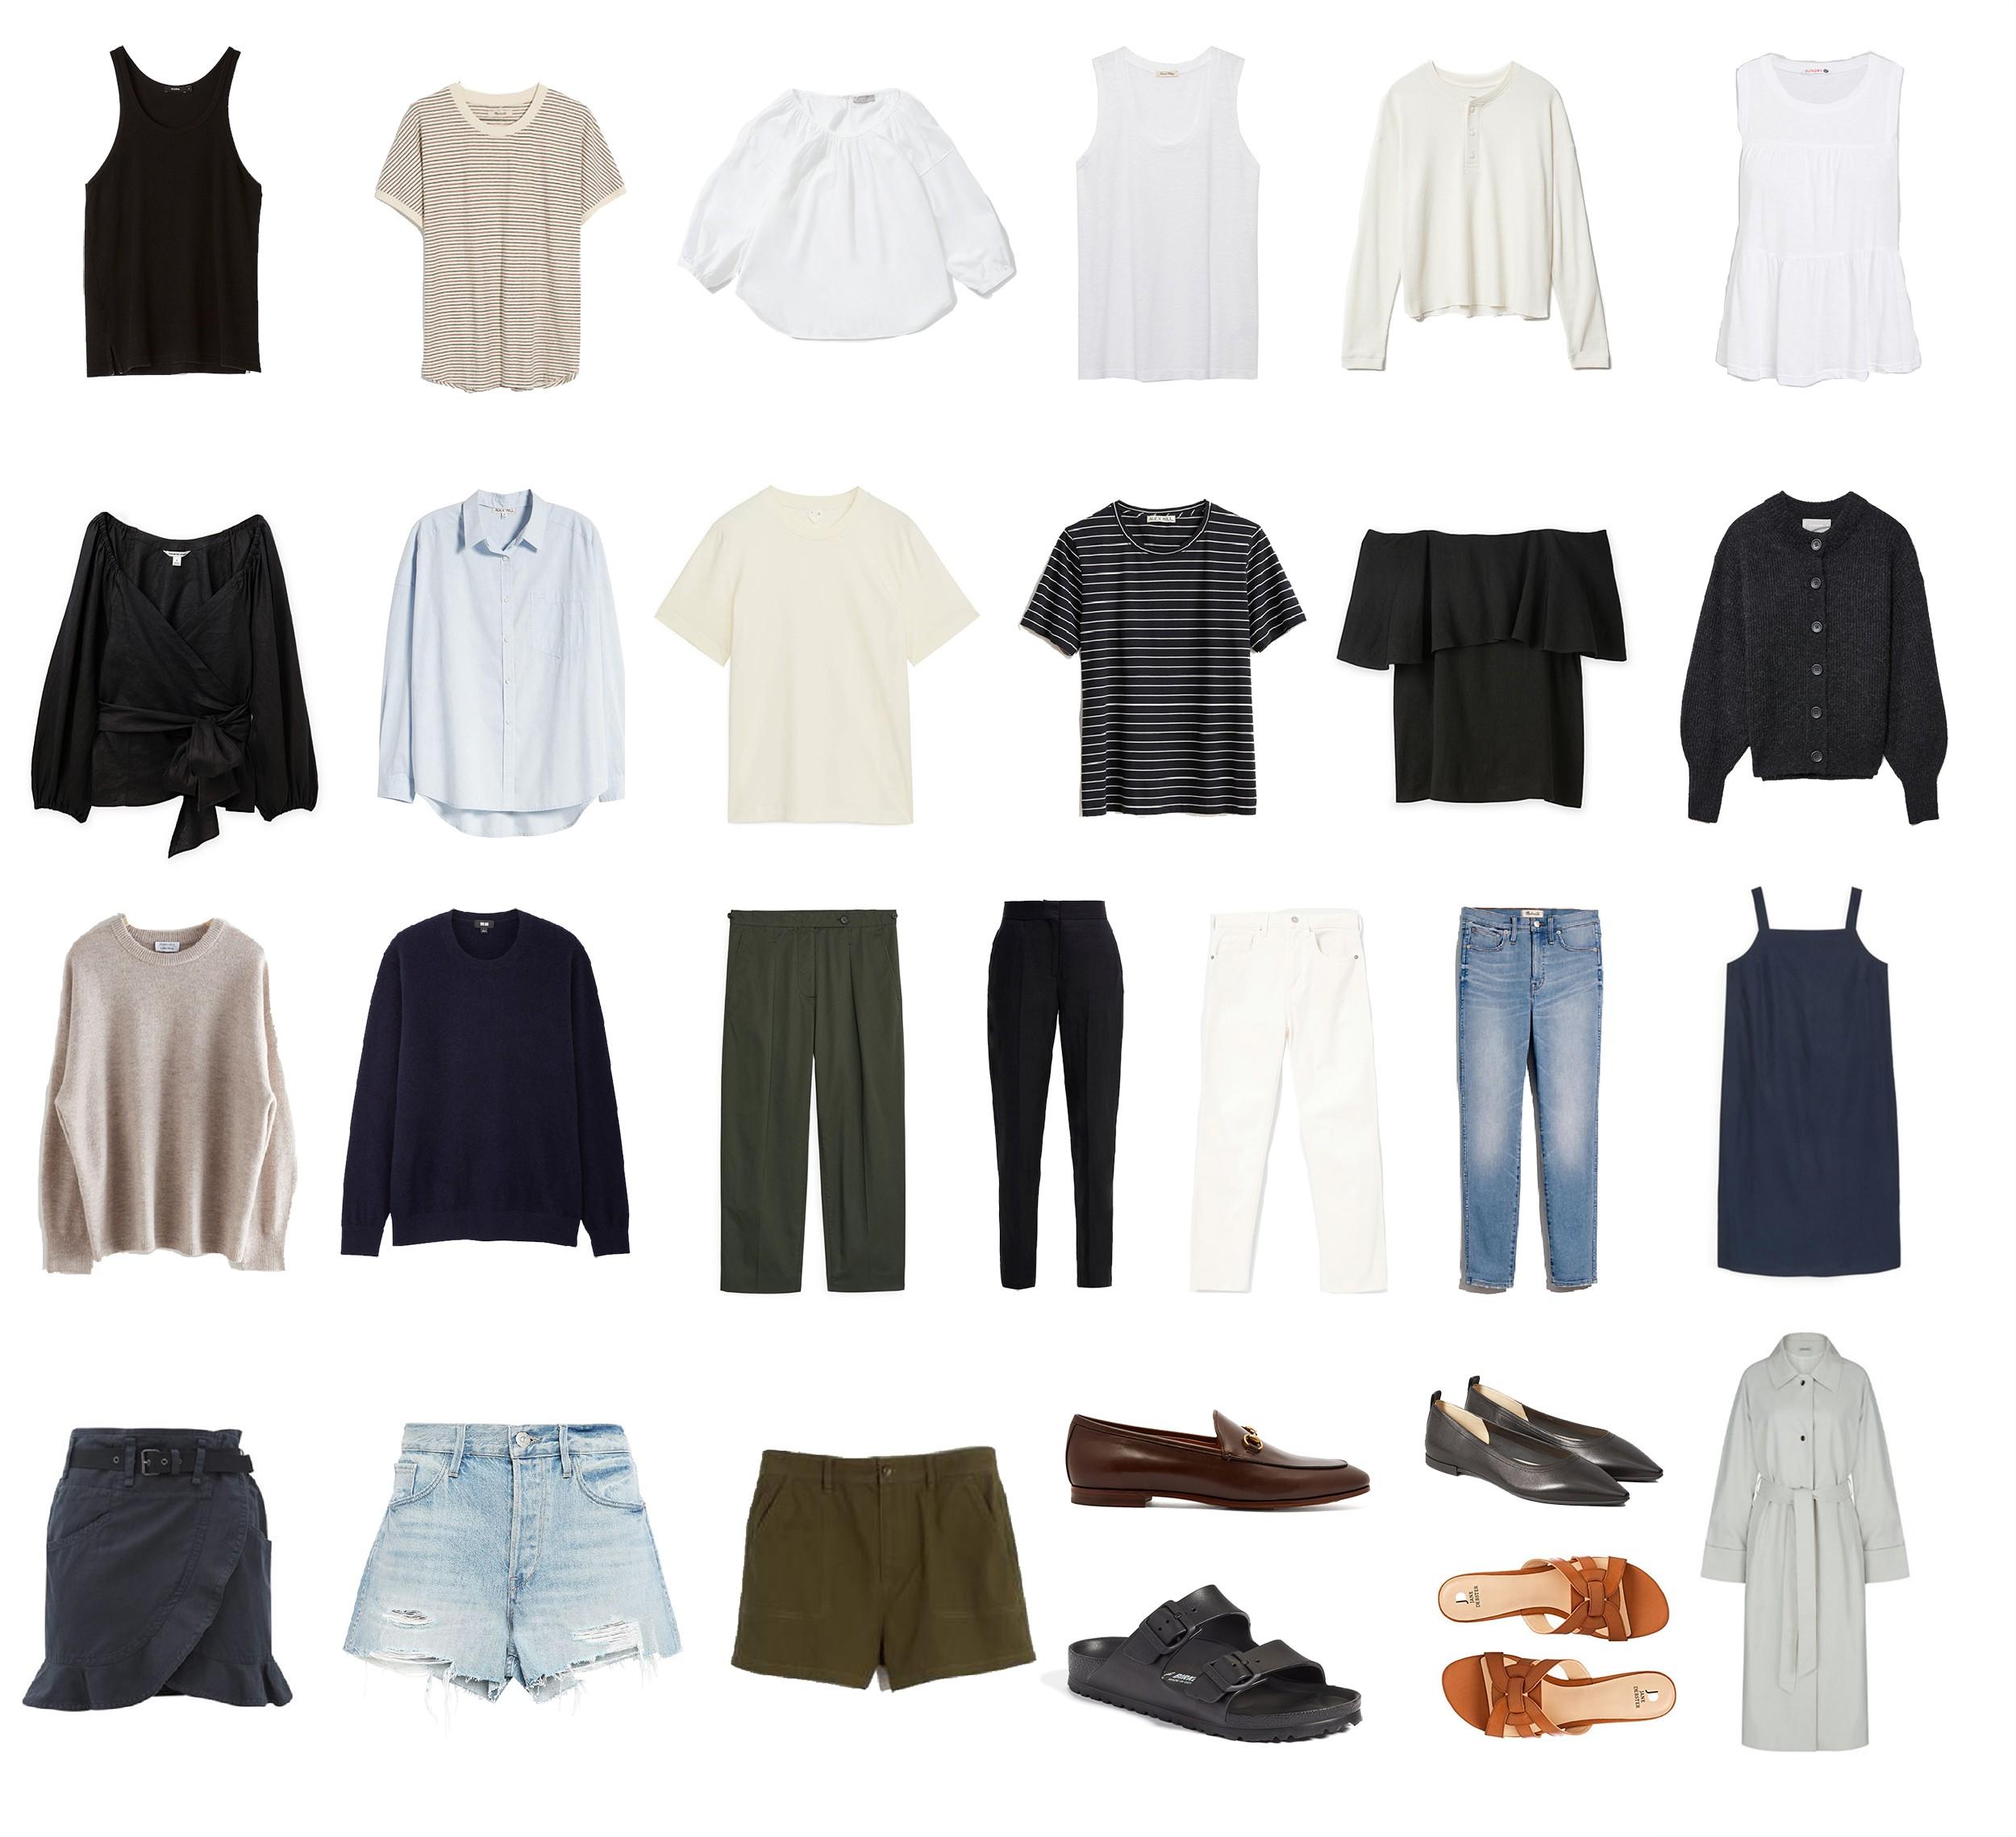 The Minimal Wardrobe Archives Mademoiselle A Minimalist Fashion Blog